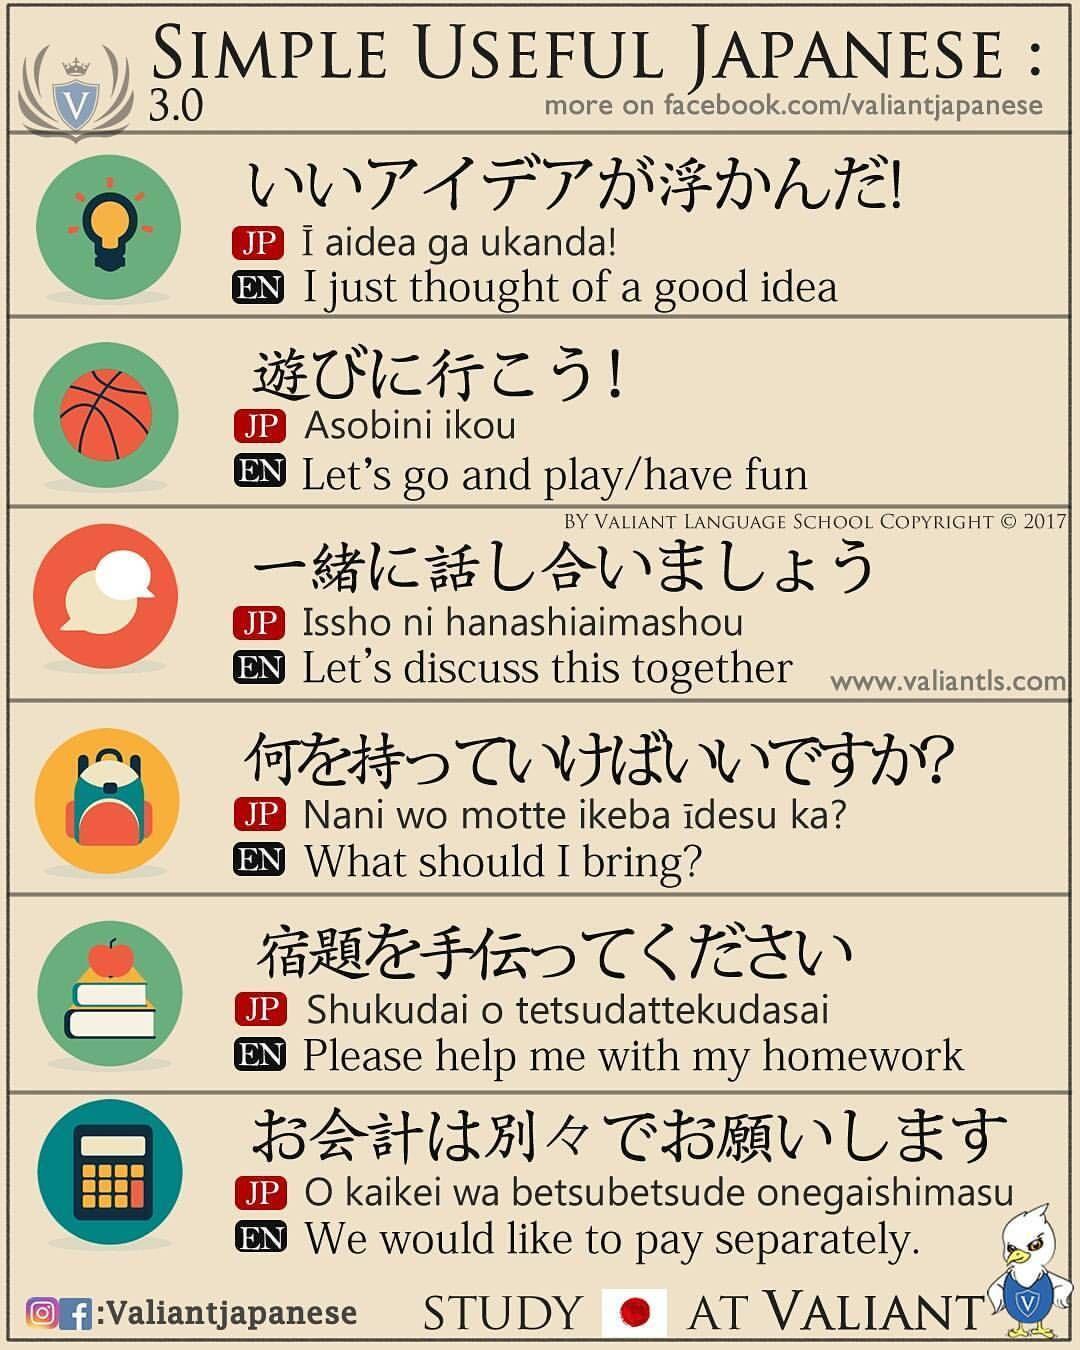 Simple Useful Japanese Part 3.0